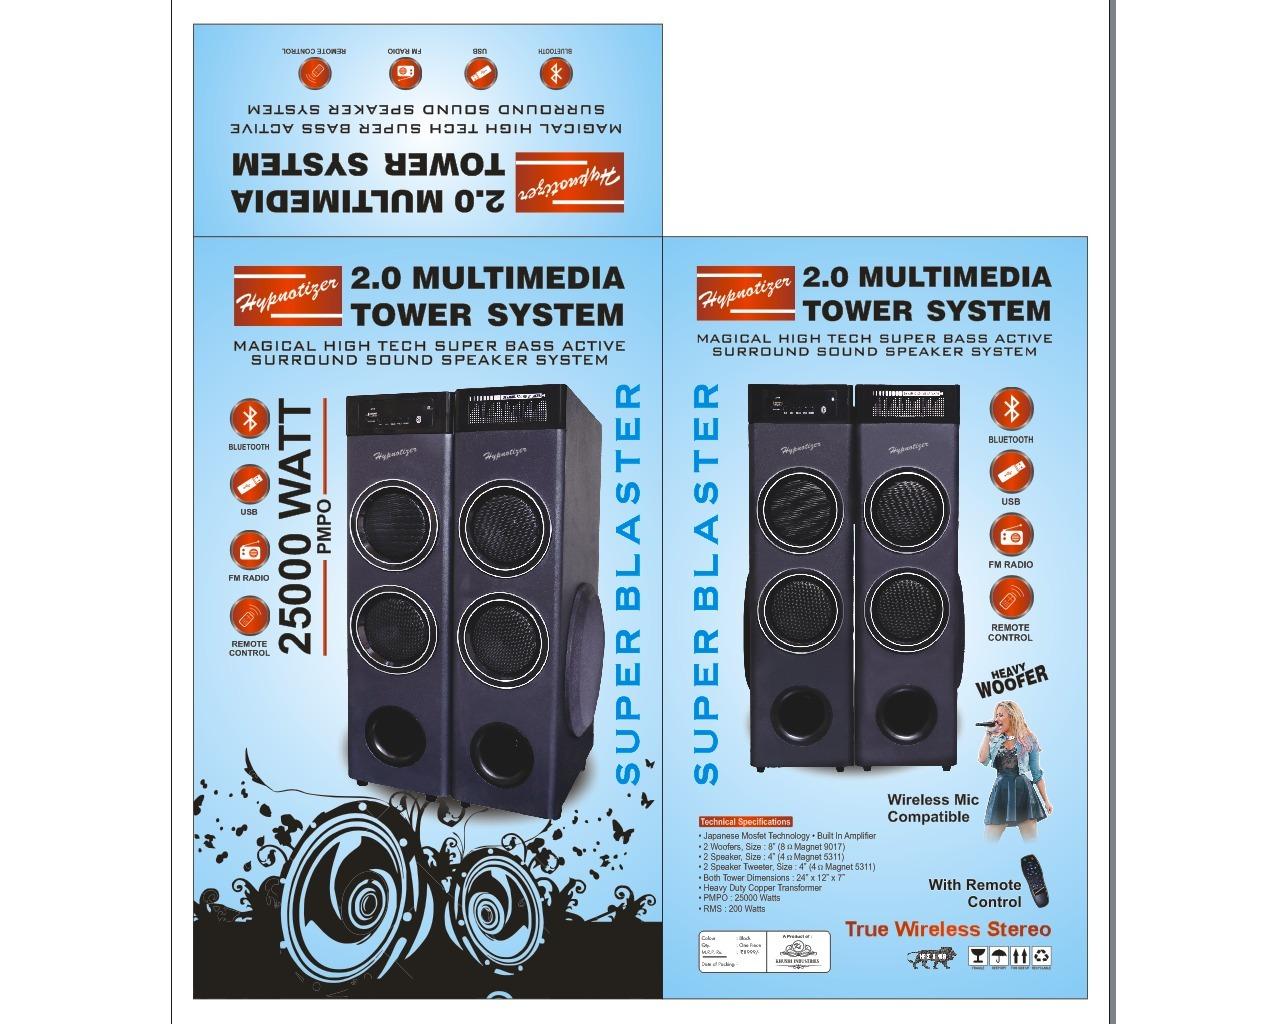 2.0 Multimedia Tower